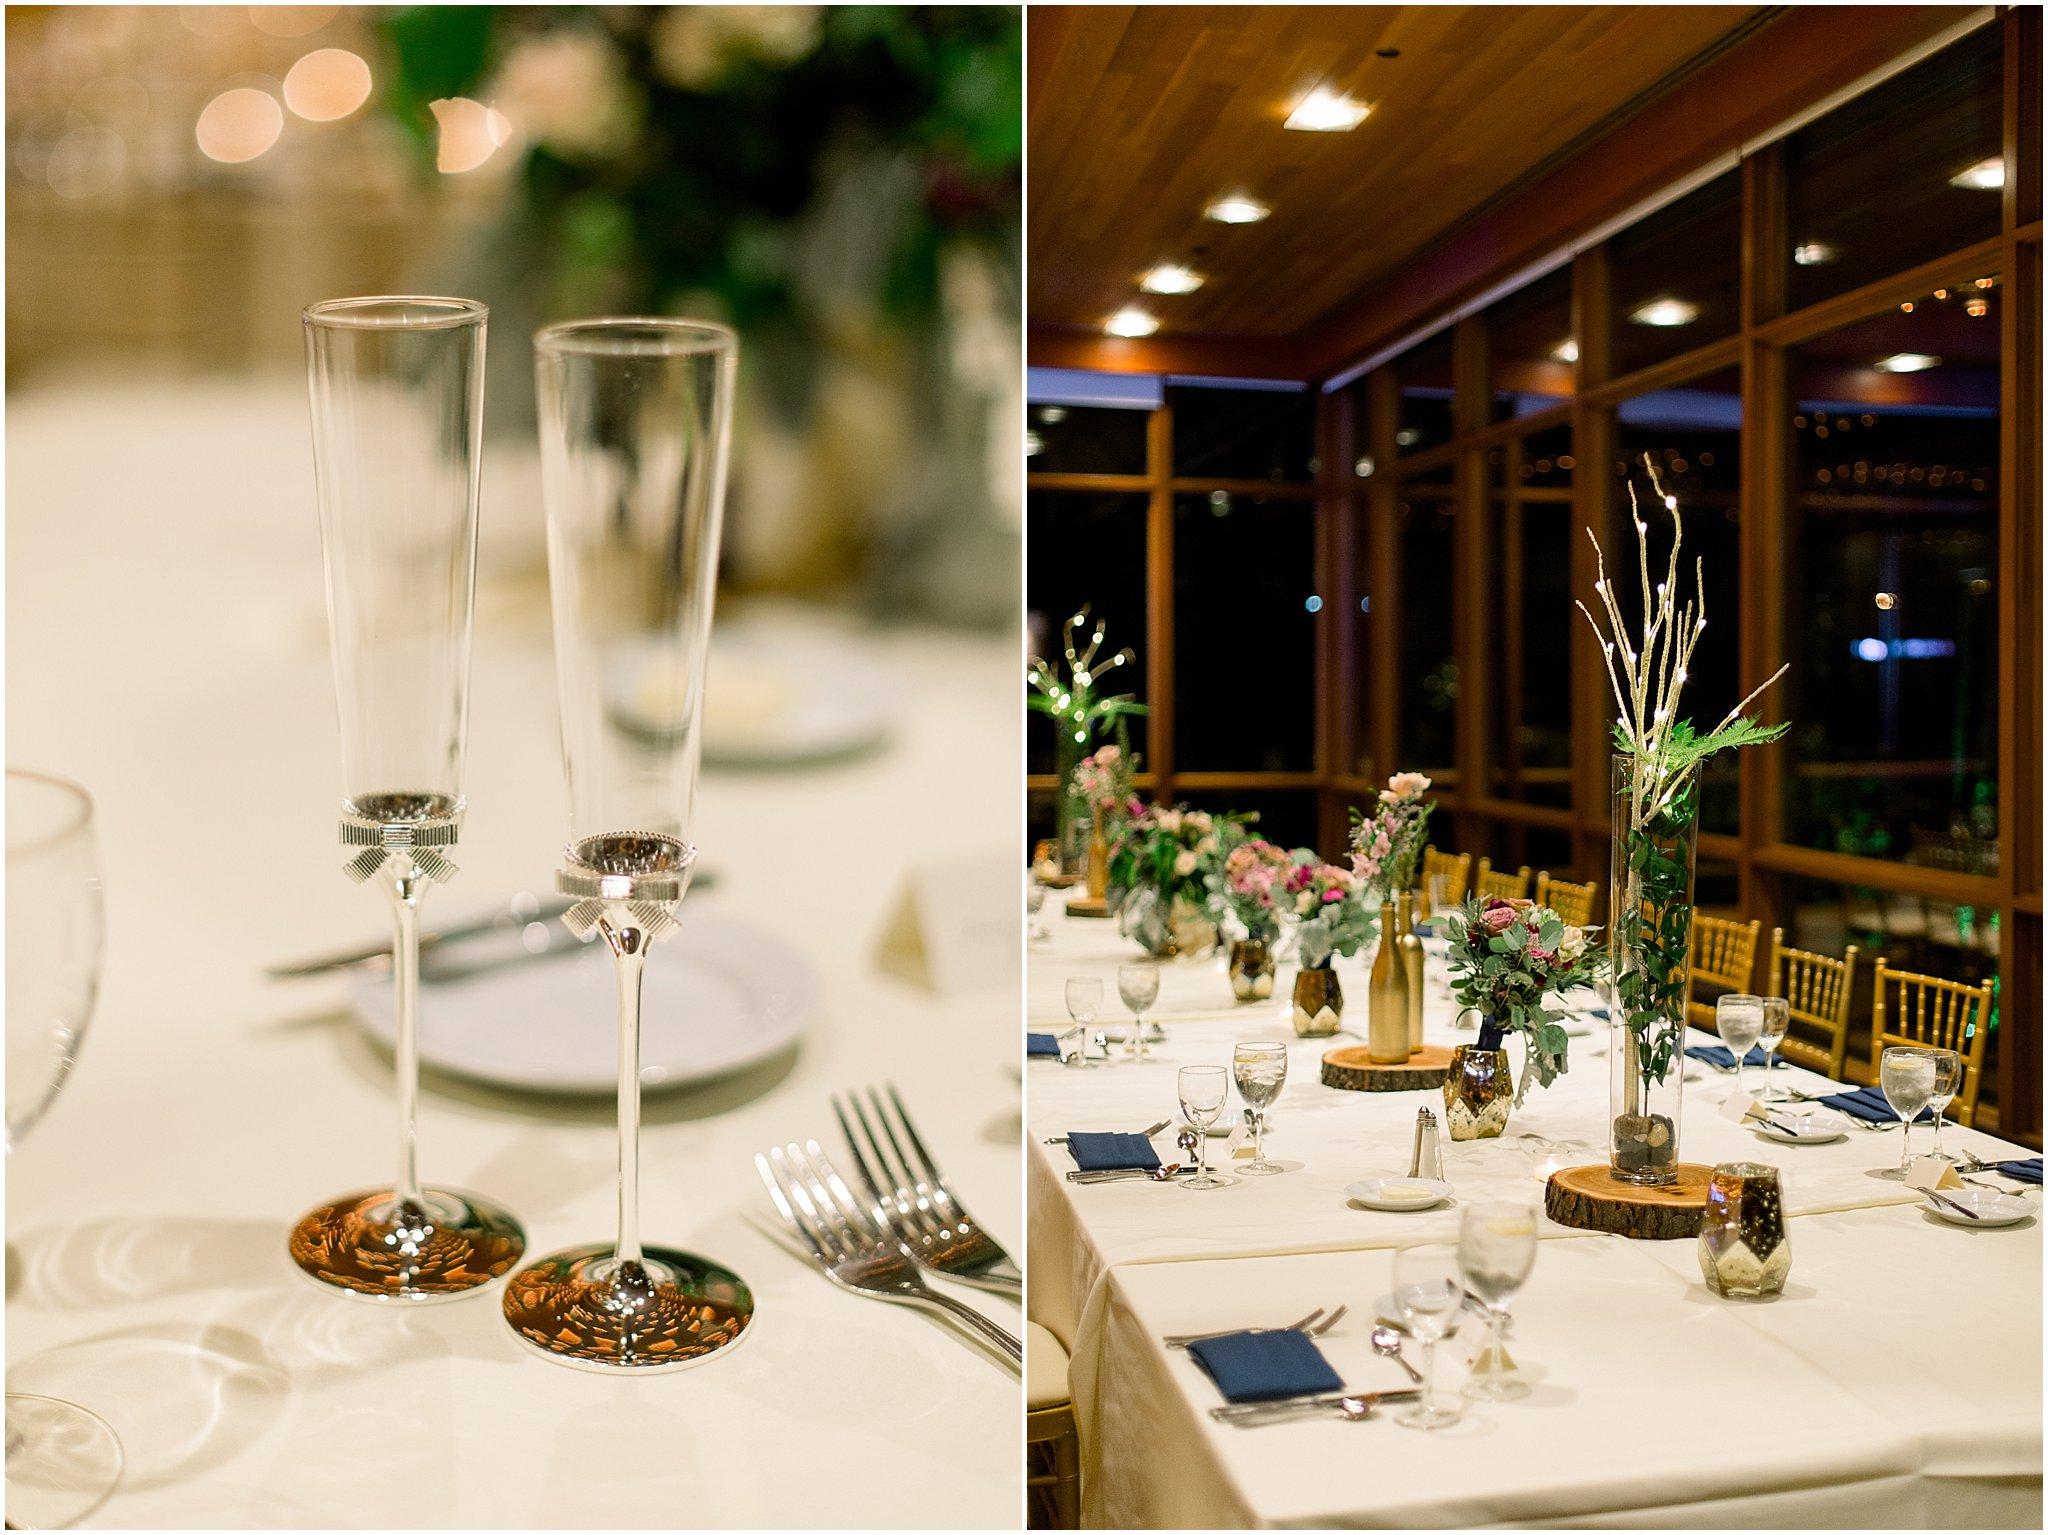 Hyatt-Lodge-Mcdonald-Campus-Wedding_0058.jpg